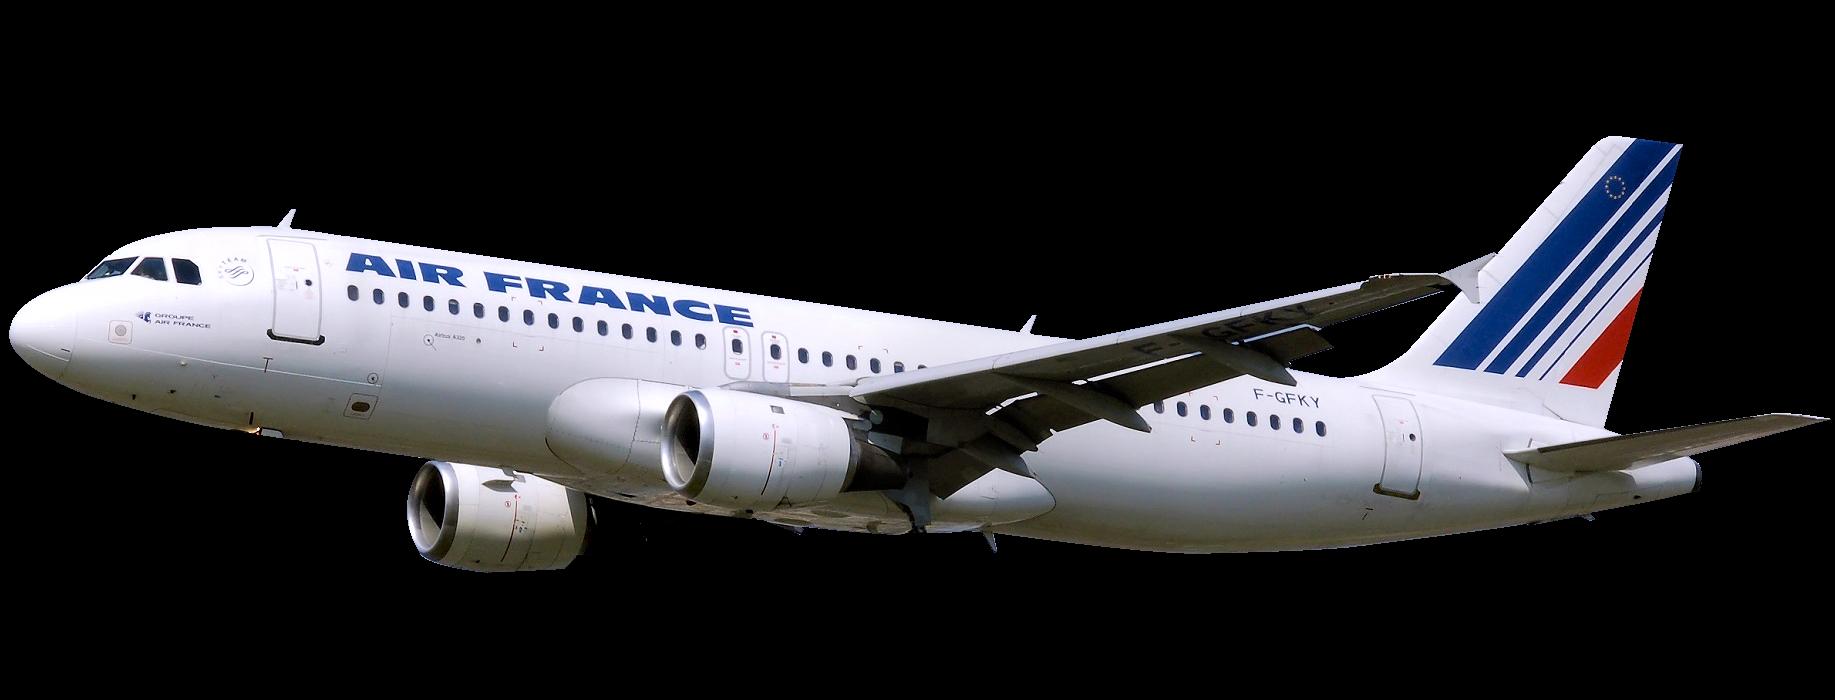 Clipart plane jetliner. Fteairplanes air france blueandred